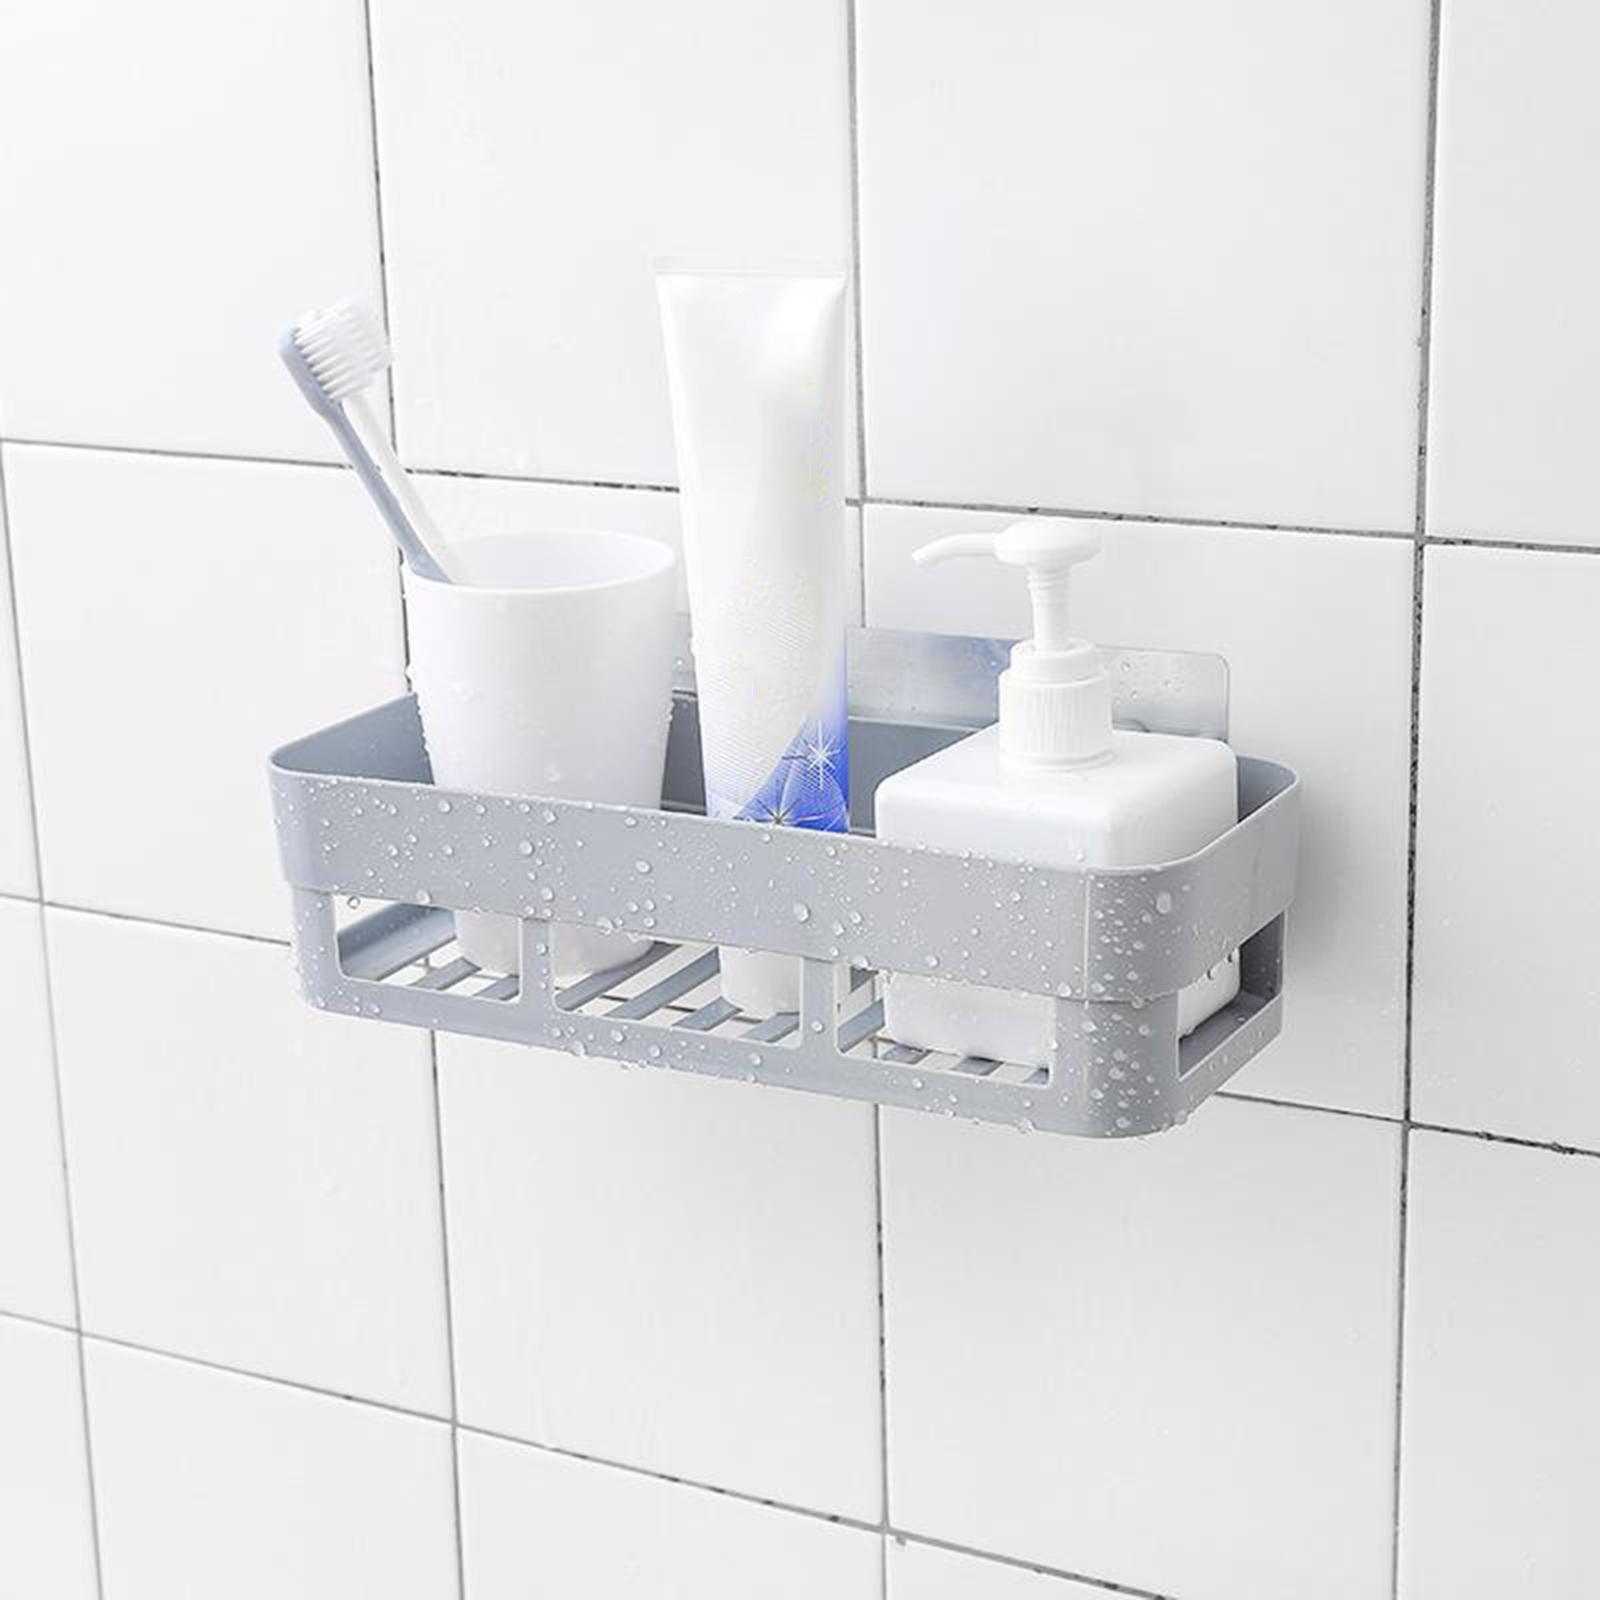 thumbnail 19 - Wall-Suction-Bathroom-Shelf-Shower-Caddy-Wall-Mount-Storage-Rack-Organizer